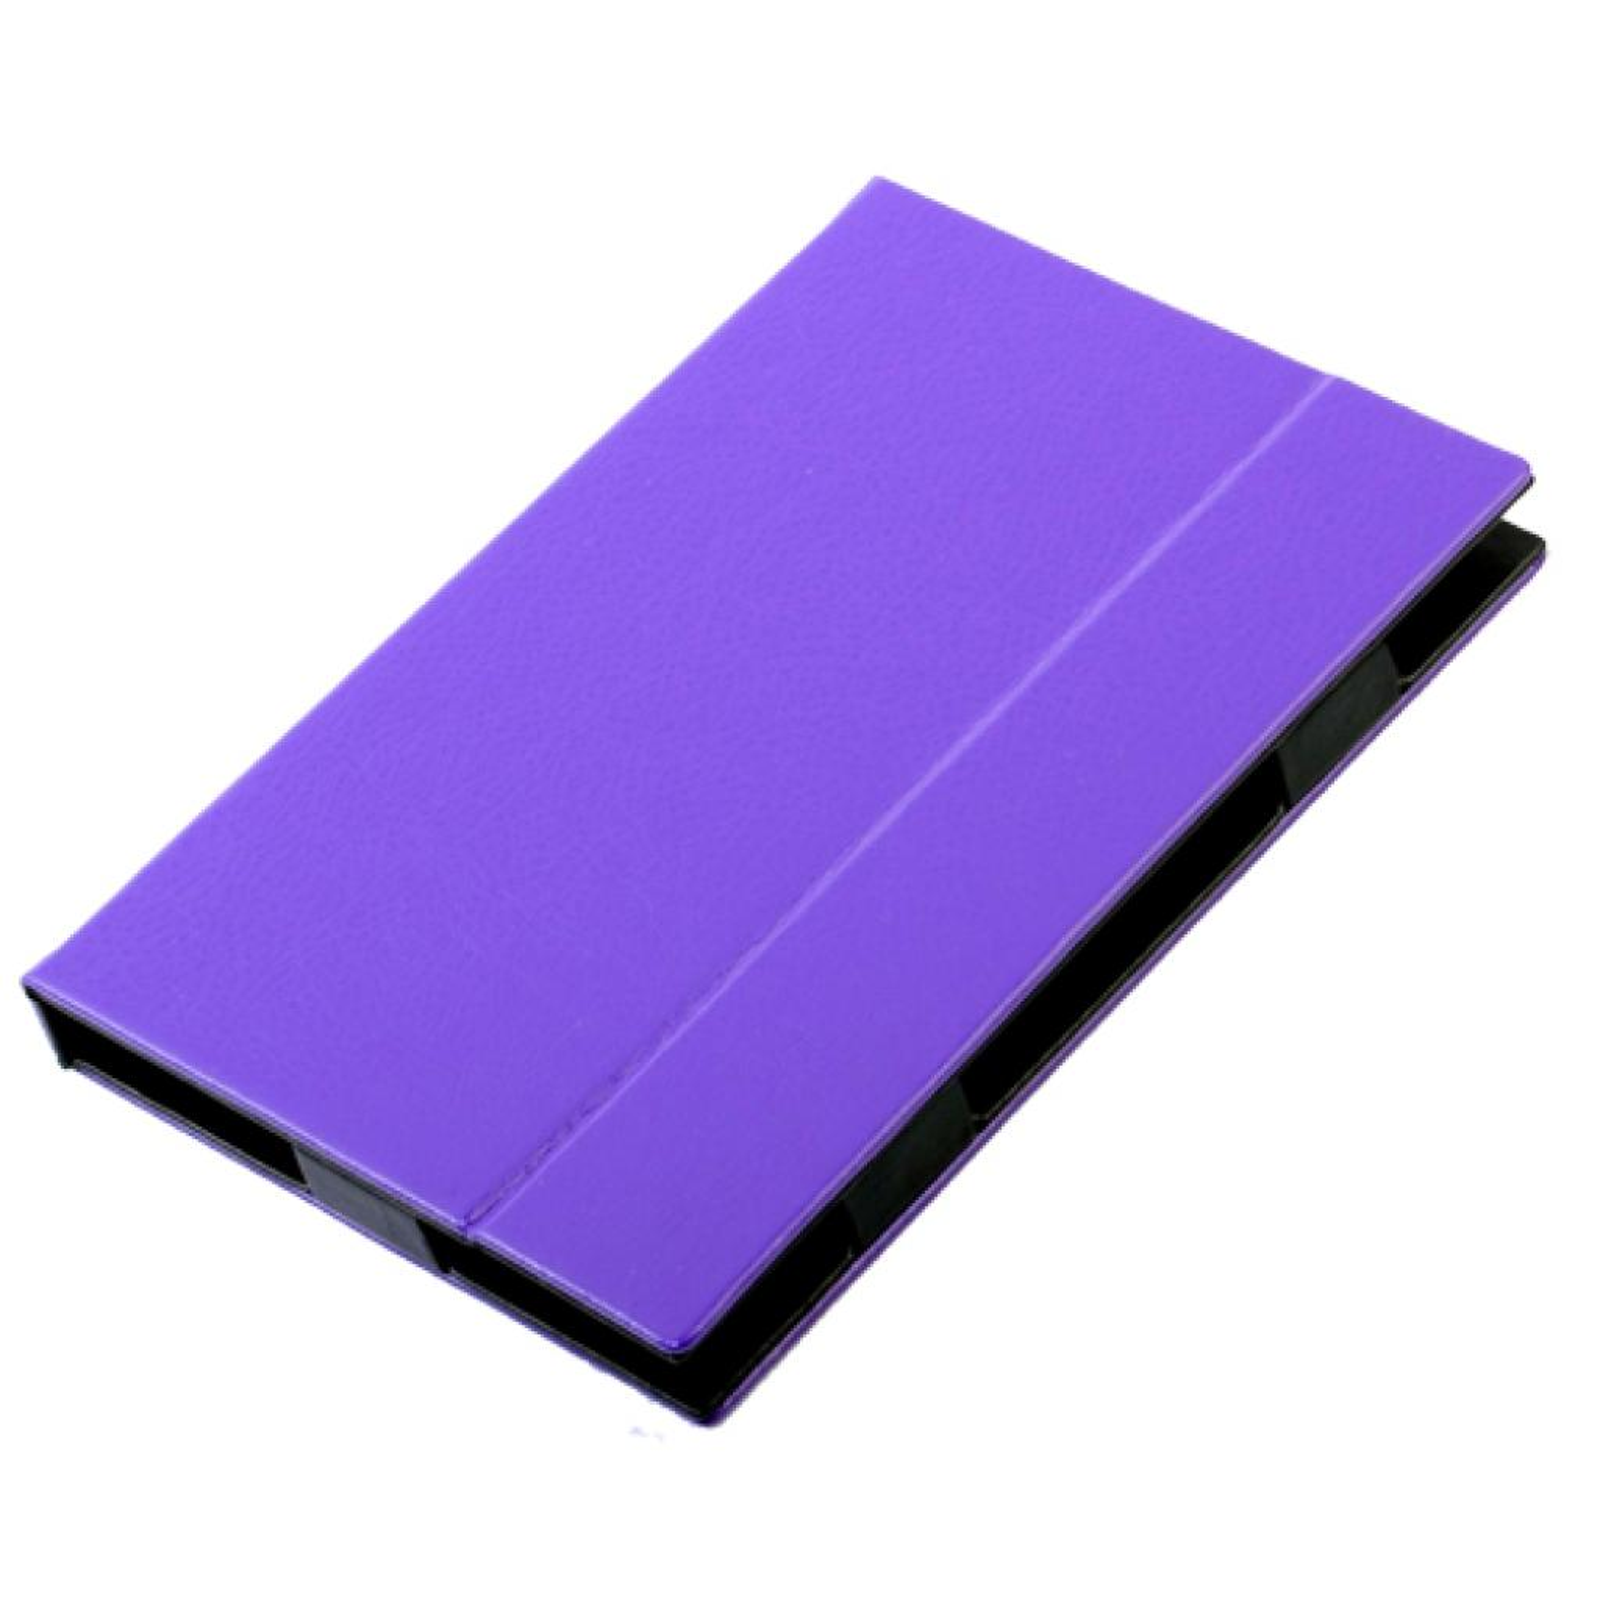 Чехол для планшета Vento 9.7 Desire Bright - purple